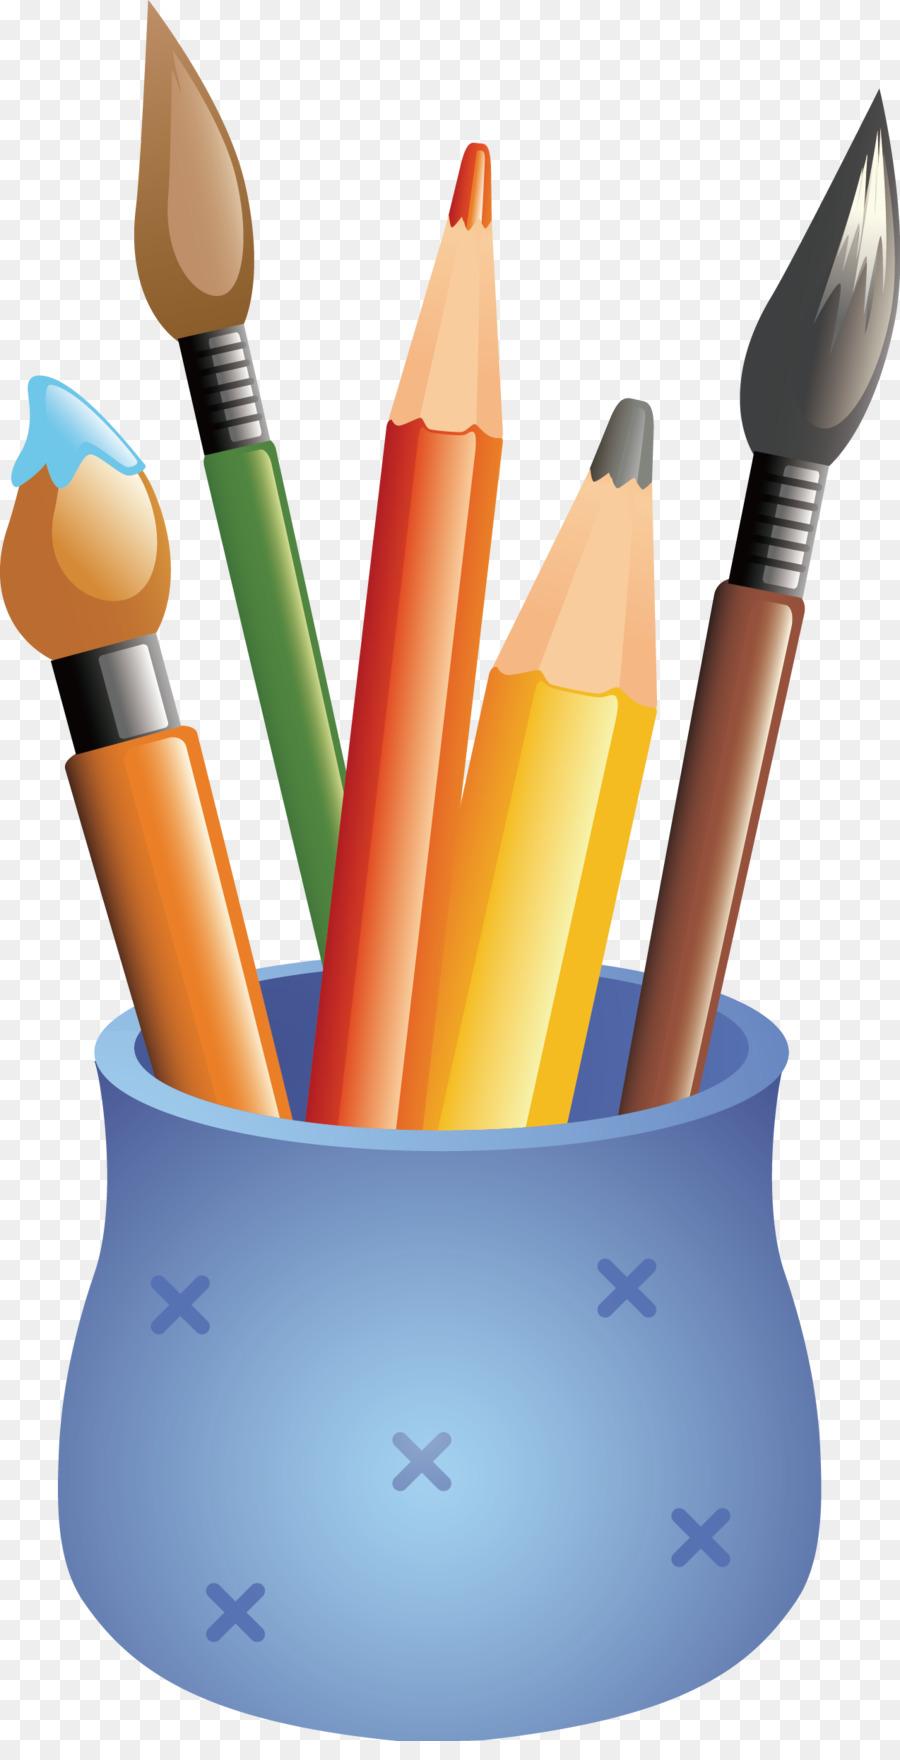 pencil case drawing colored pencil cartoon pen holder png download